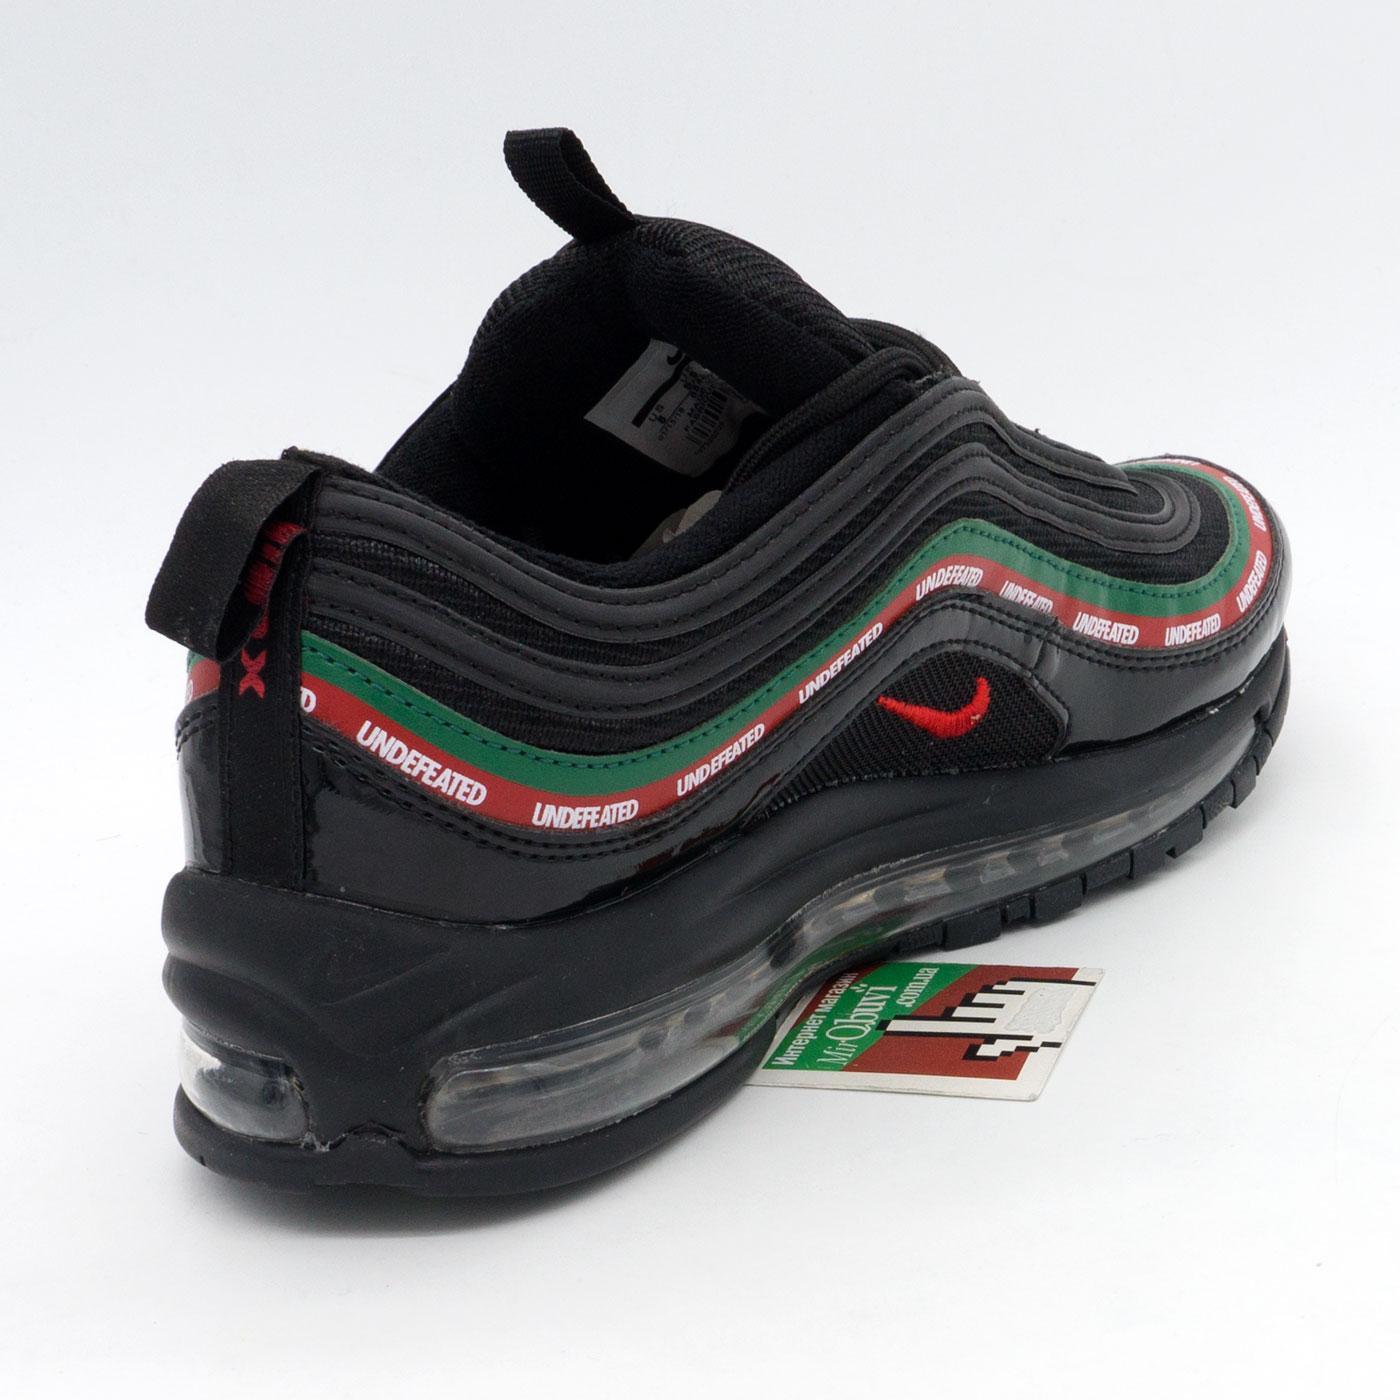 фото back Черные кроссовки Nike air max 97 UNDFTD. Топ качество! back